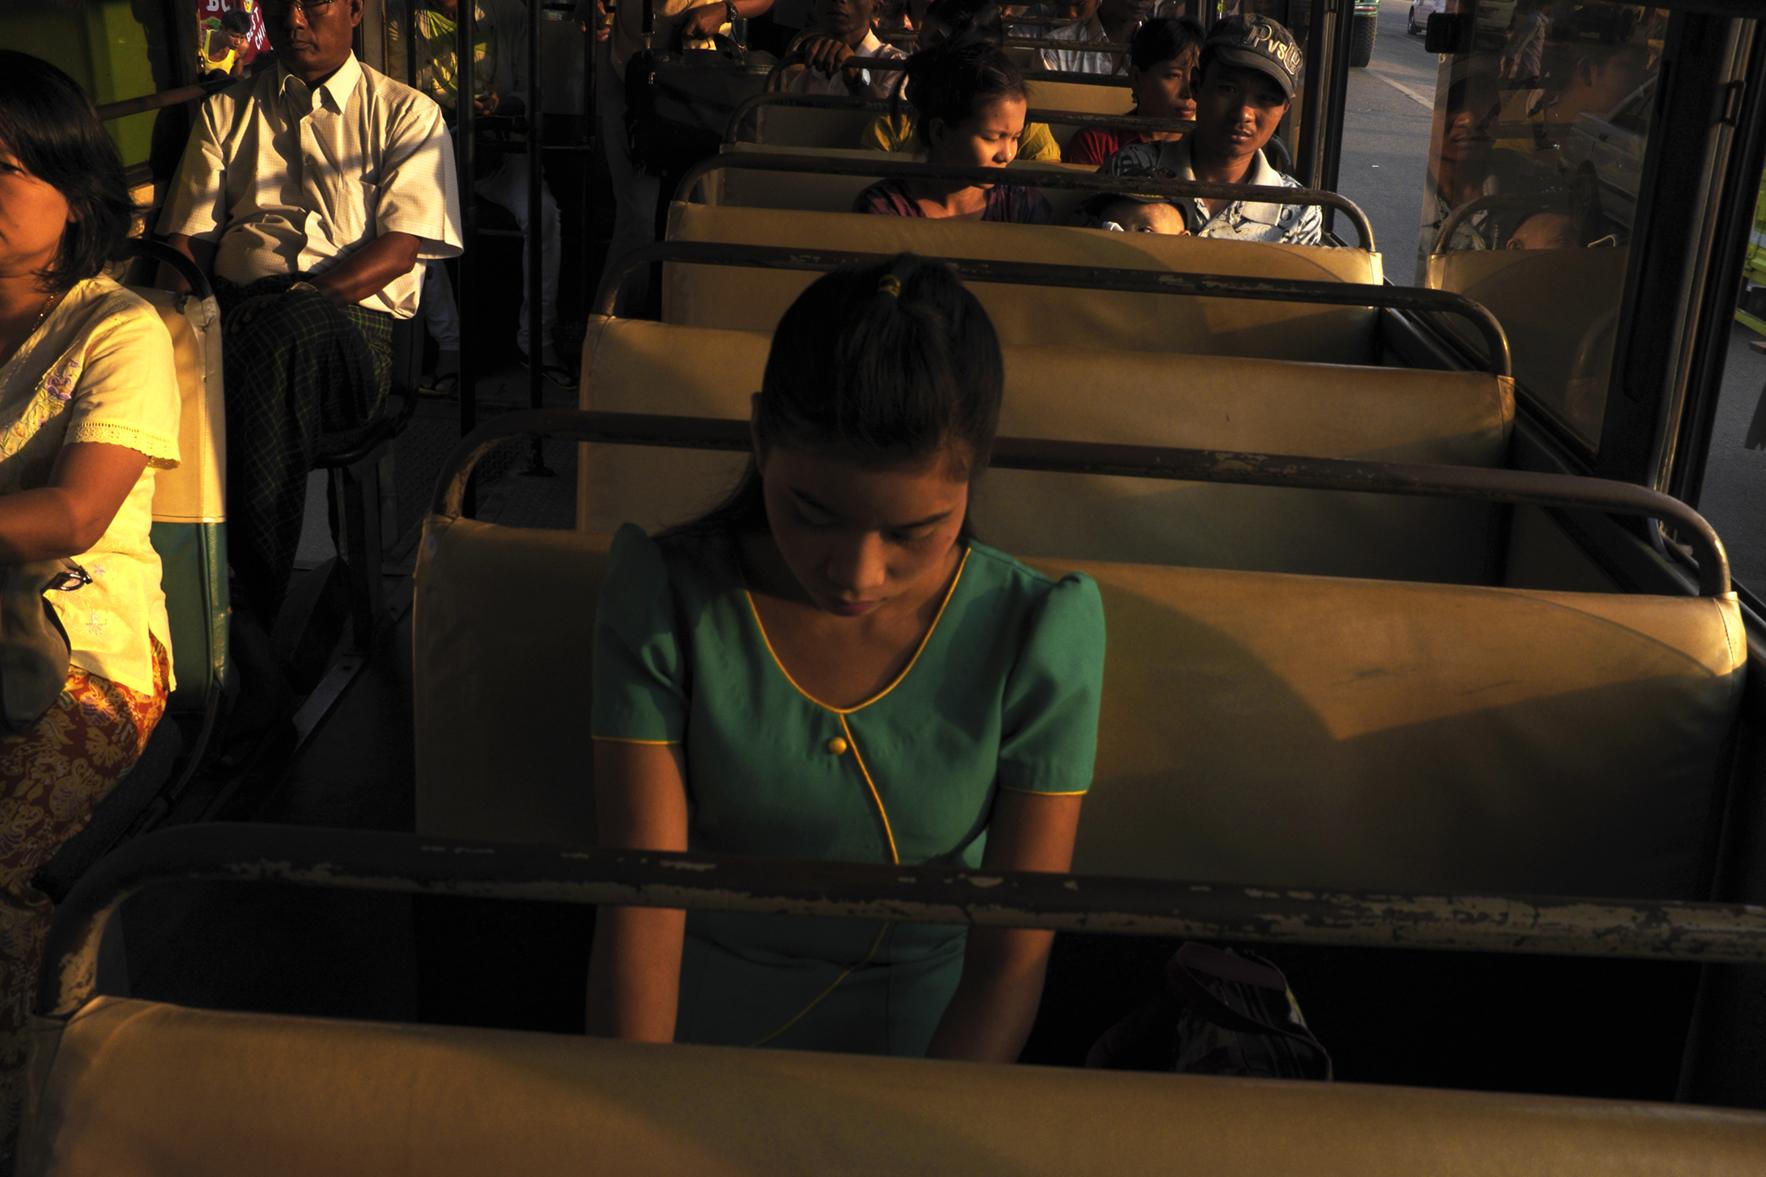 Bus Commuter. Rangoon, Burma. 2013